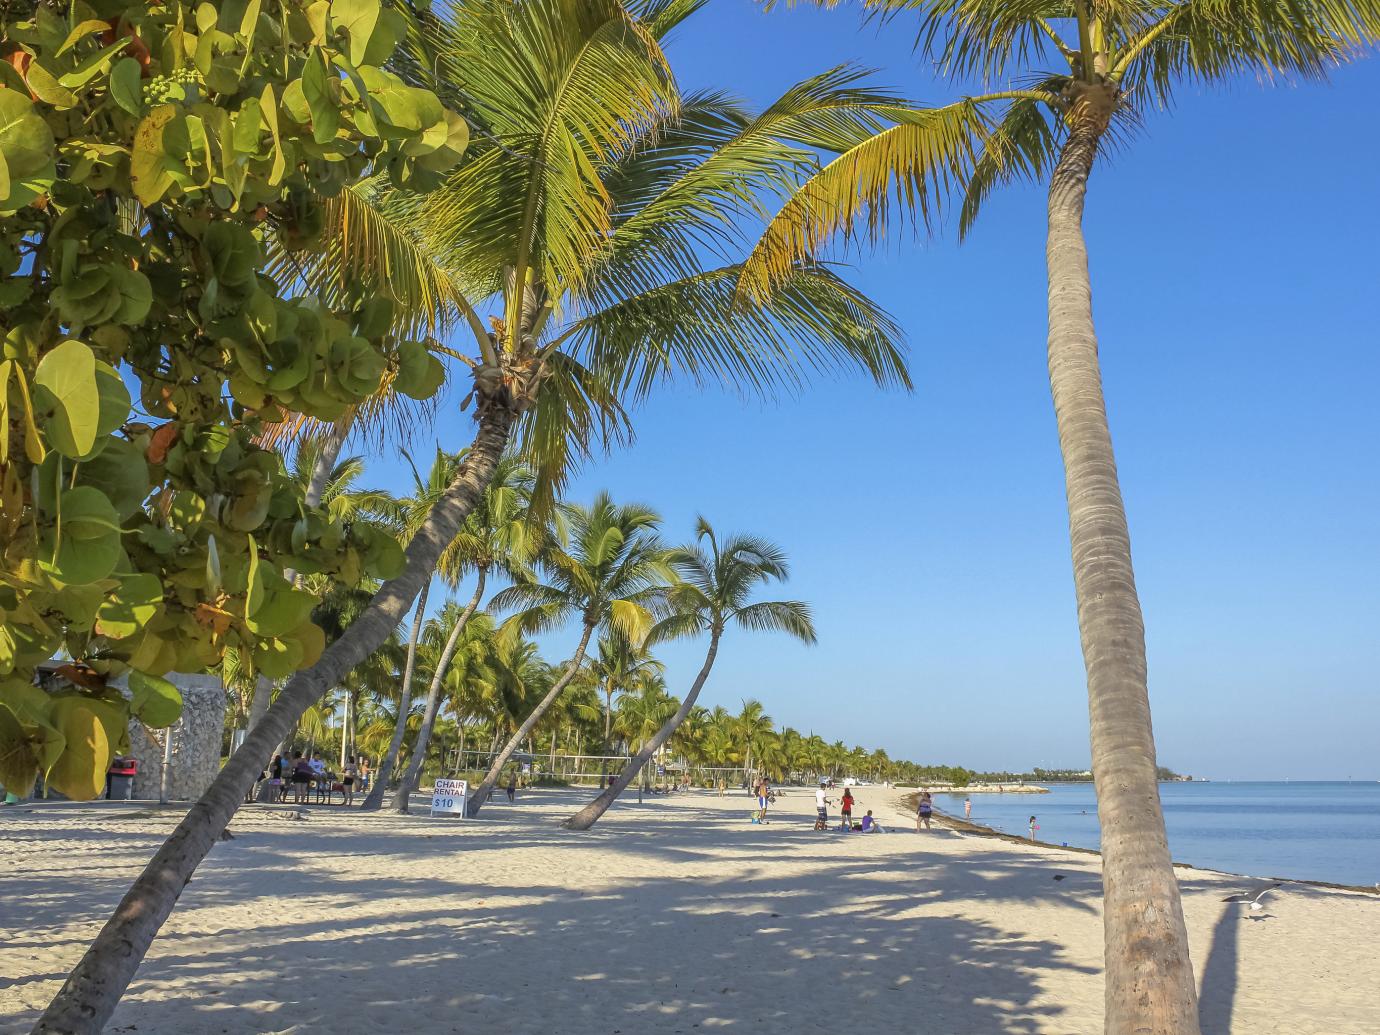 Smathers Beach in Key West